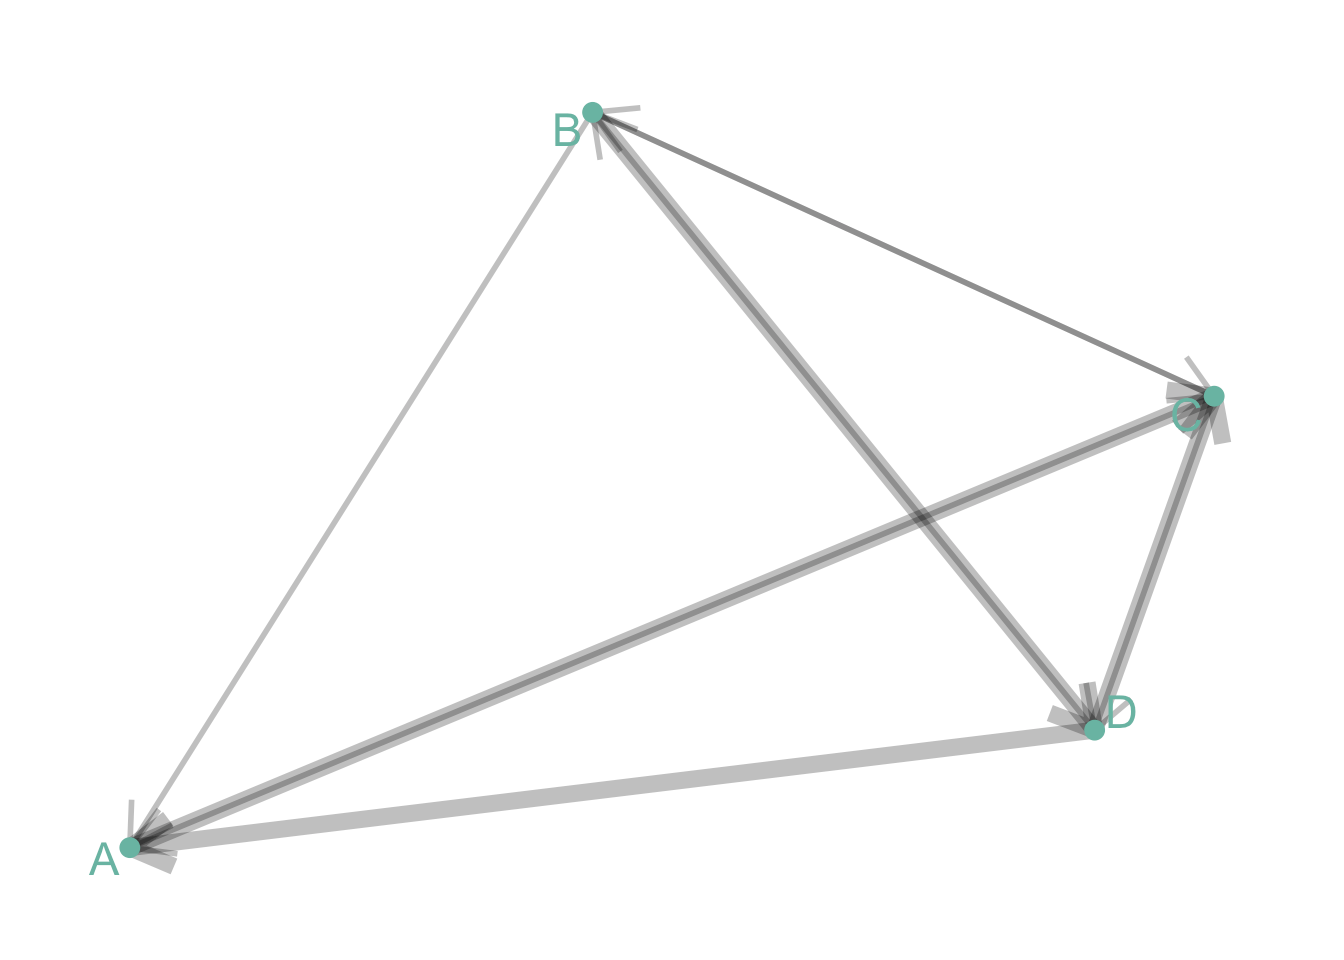 Network Diagram From Data To Viz